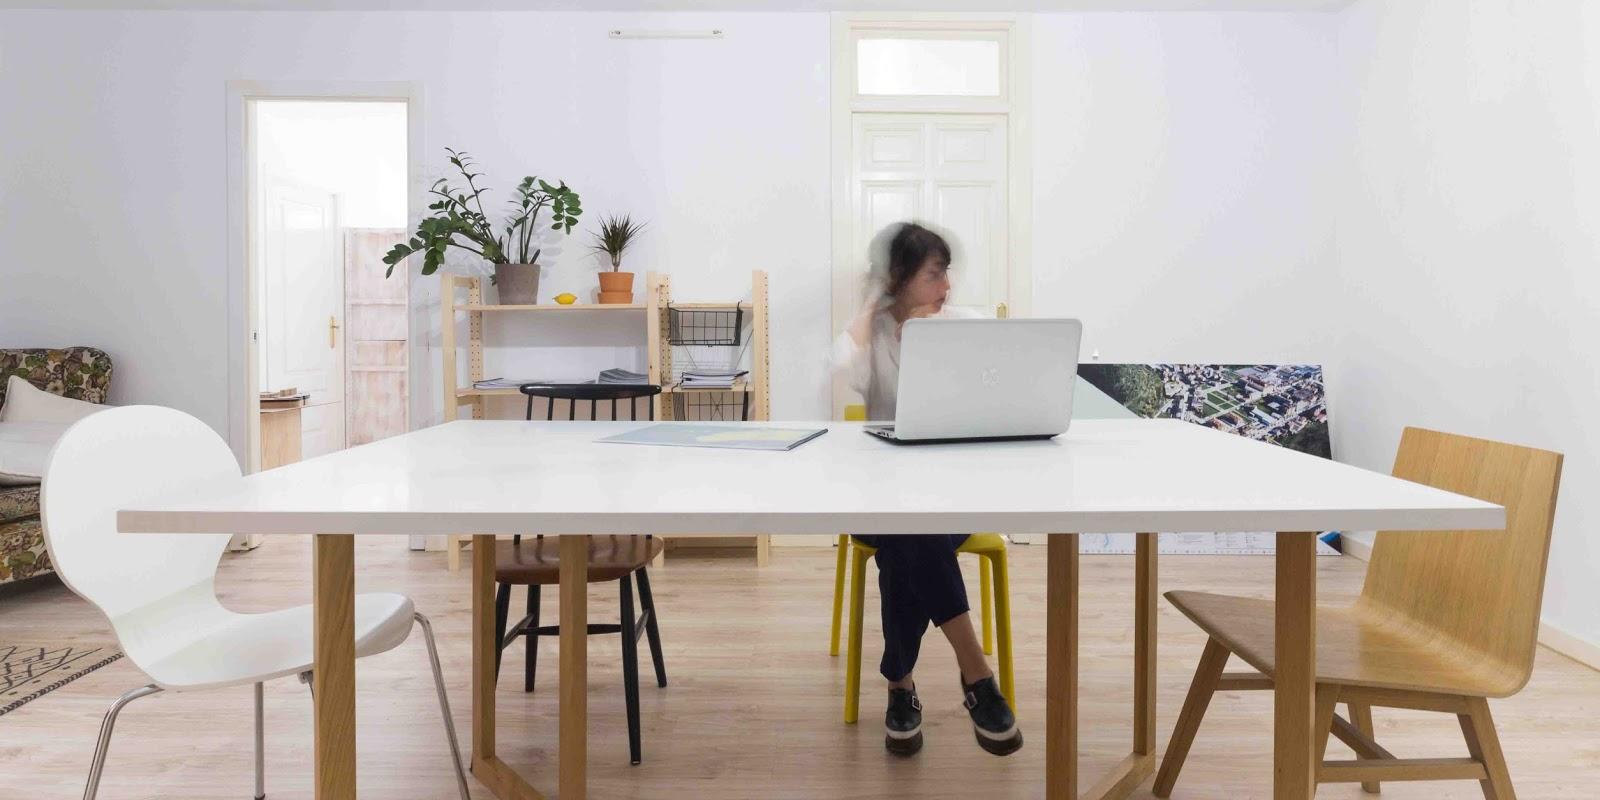 5 puntos básicos para una arquitectura digna Paisaje Transversal